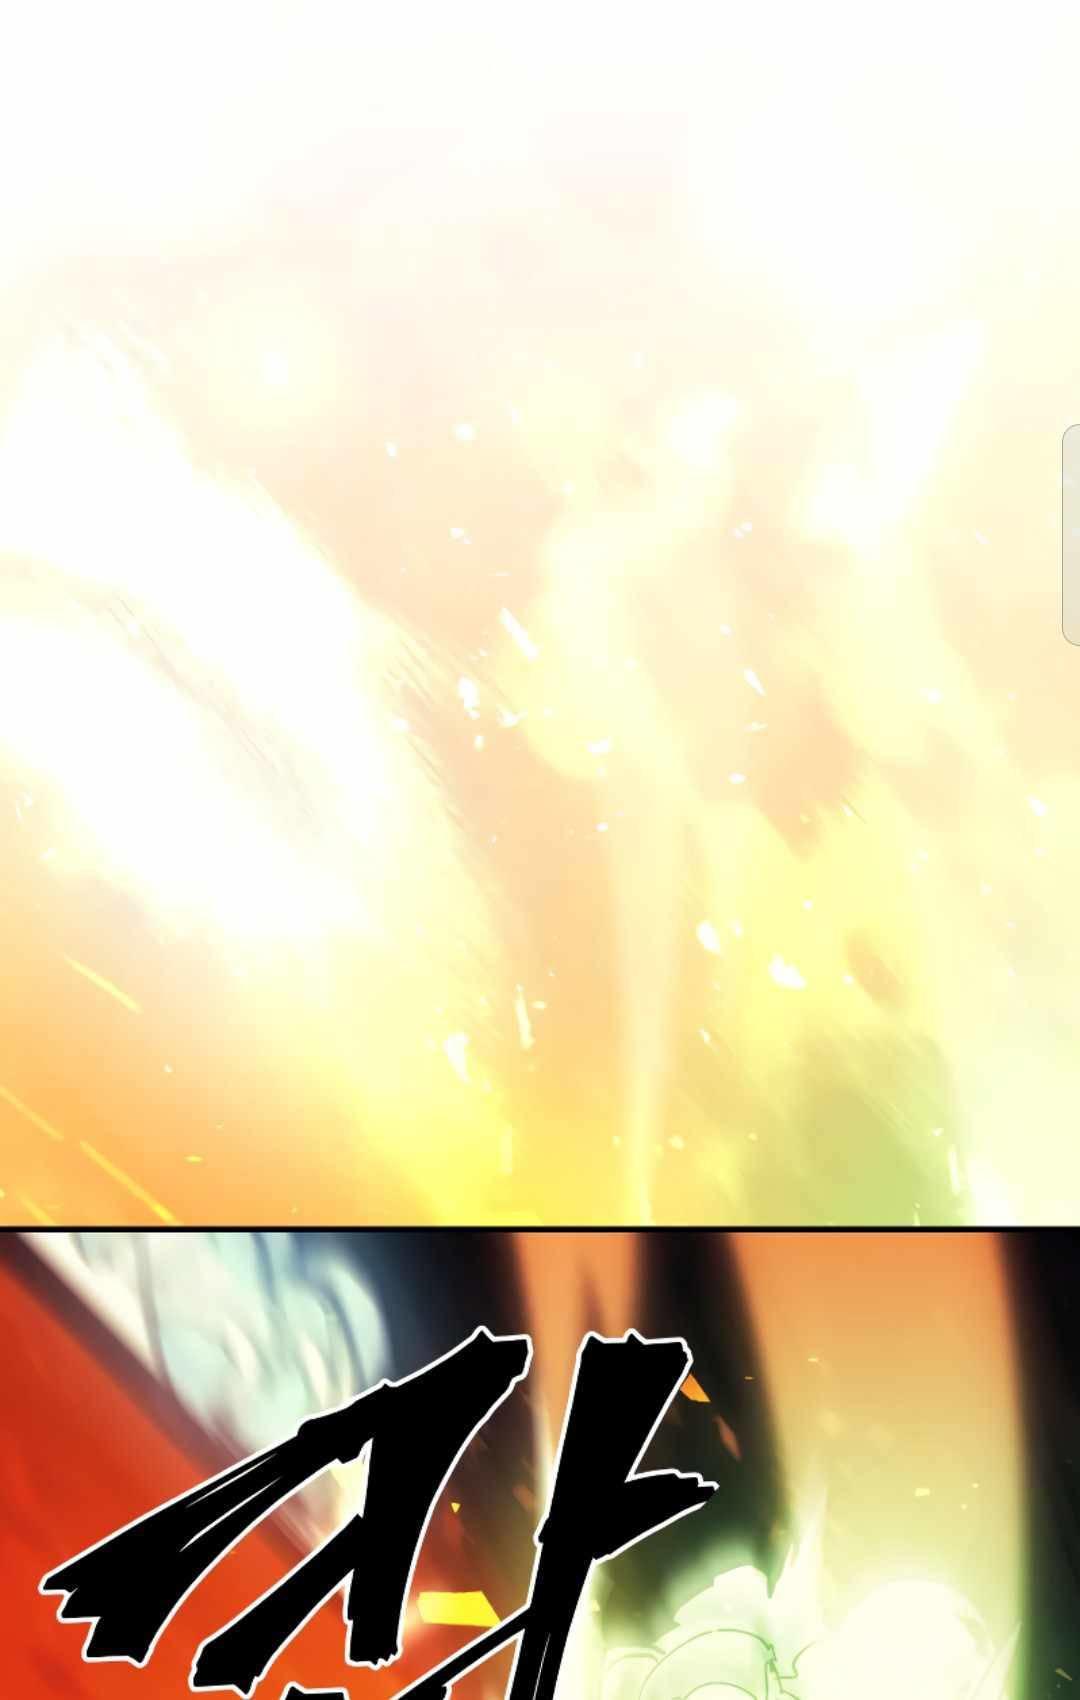 A Returner's Magic Should Be Special Chapter 163 page 24 - Mangakakalot